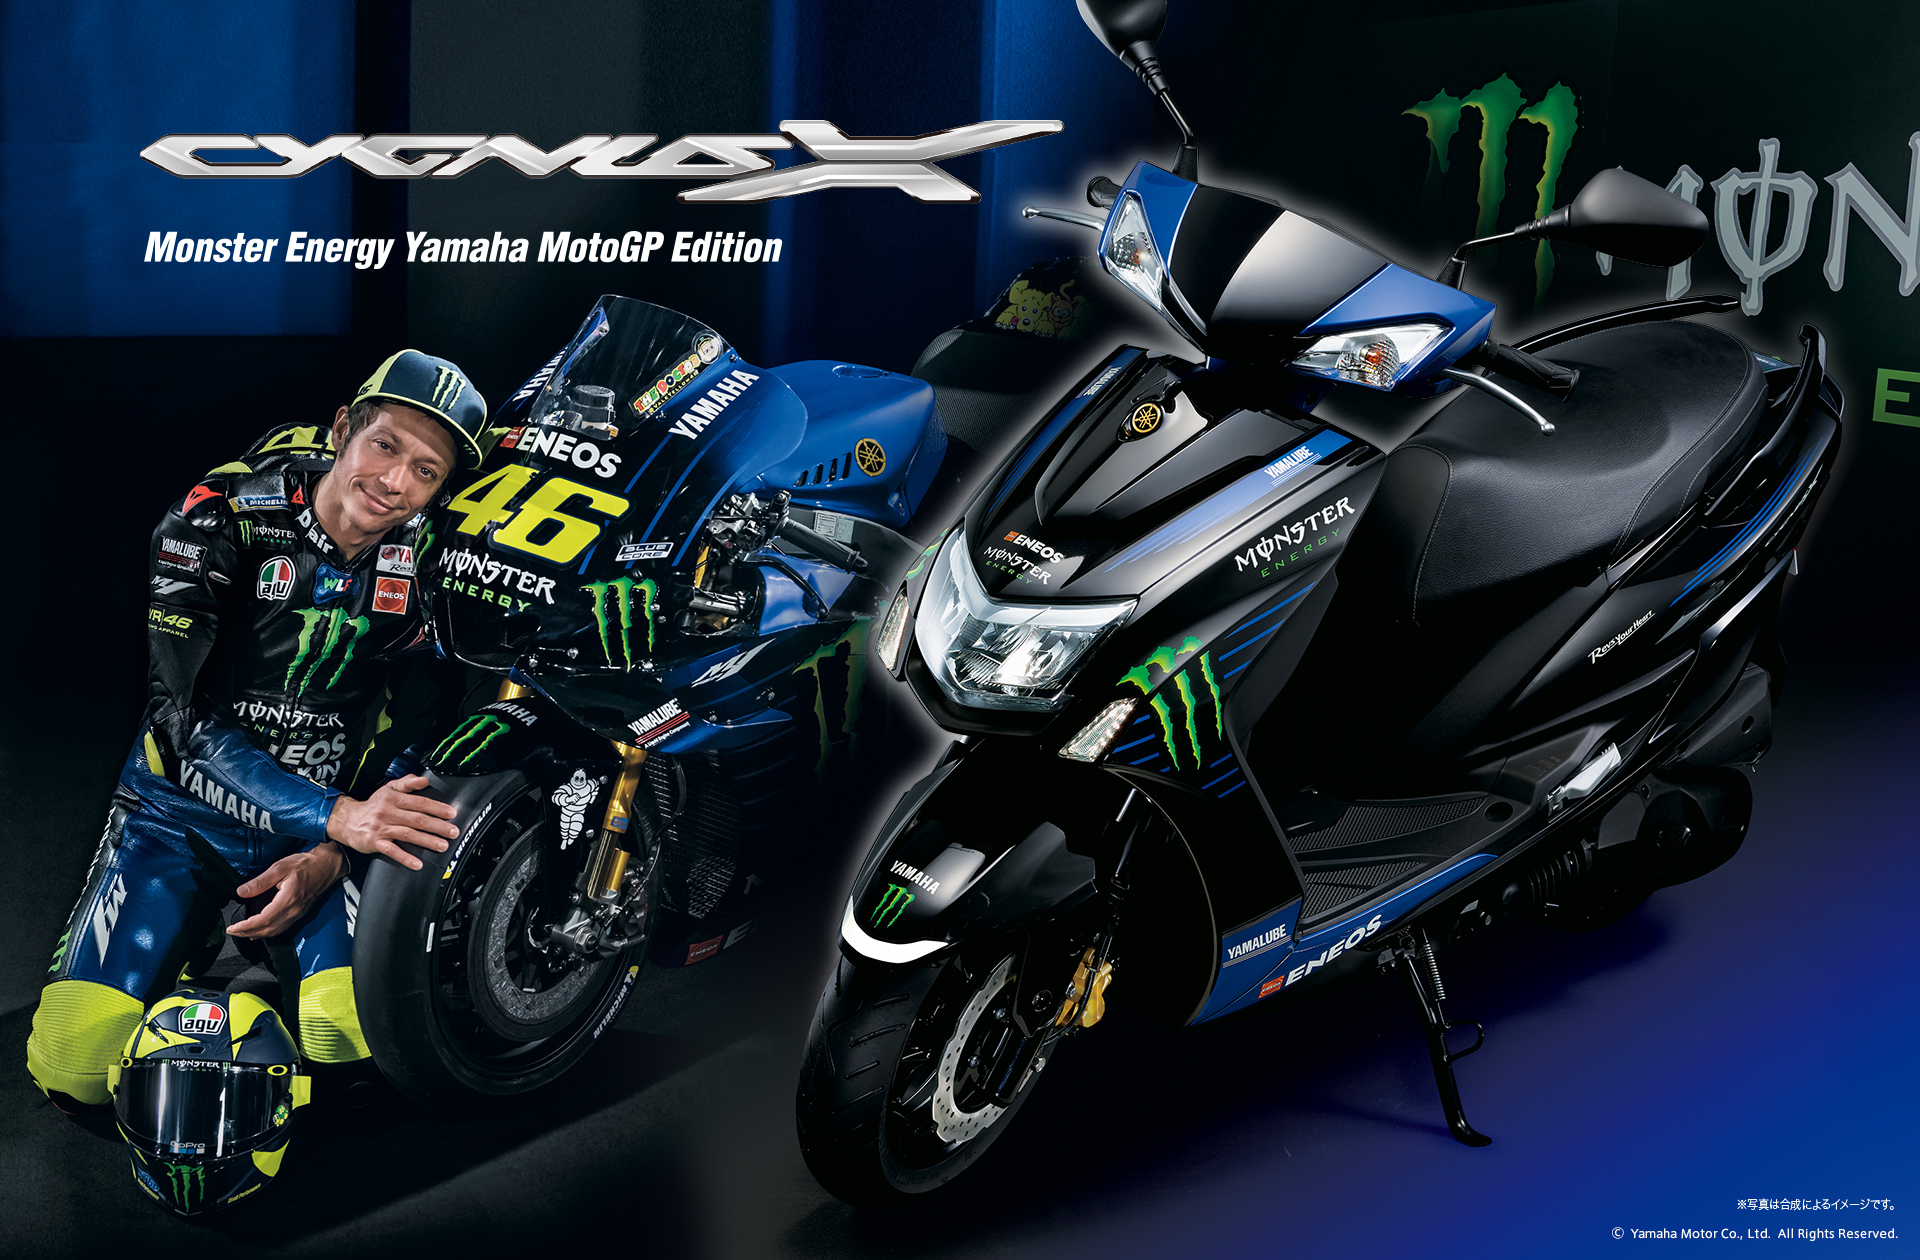 Cygnus X Monster Energy Yamaha Motogp Edition 沖縄ヤマハのホームページ